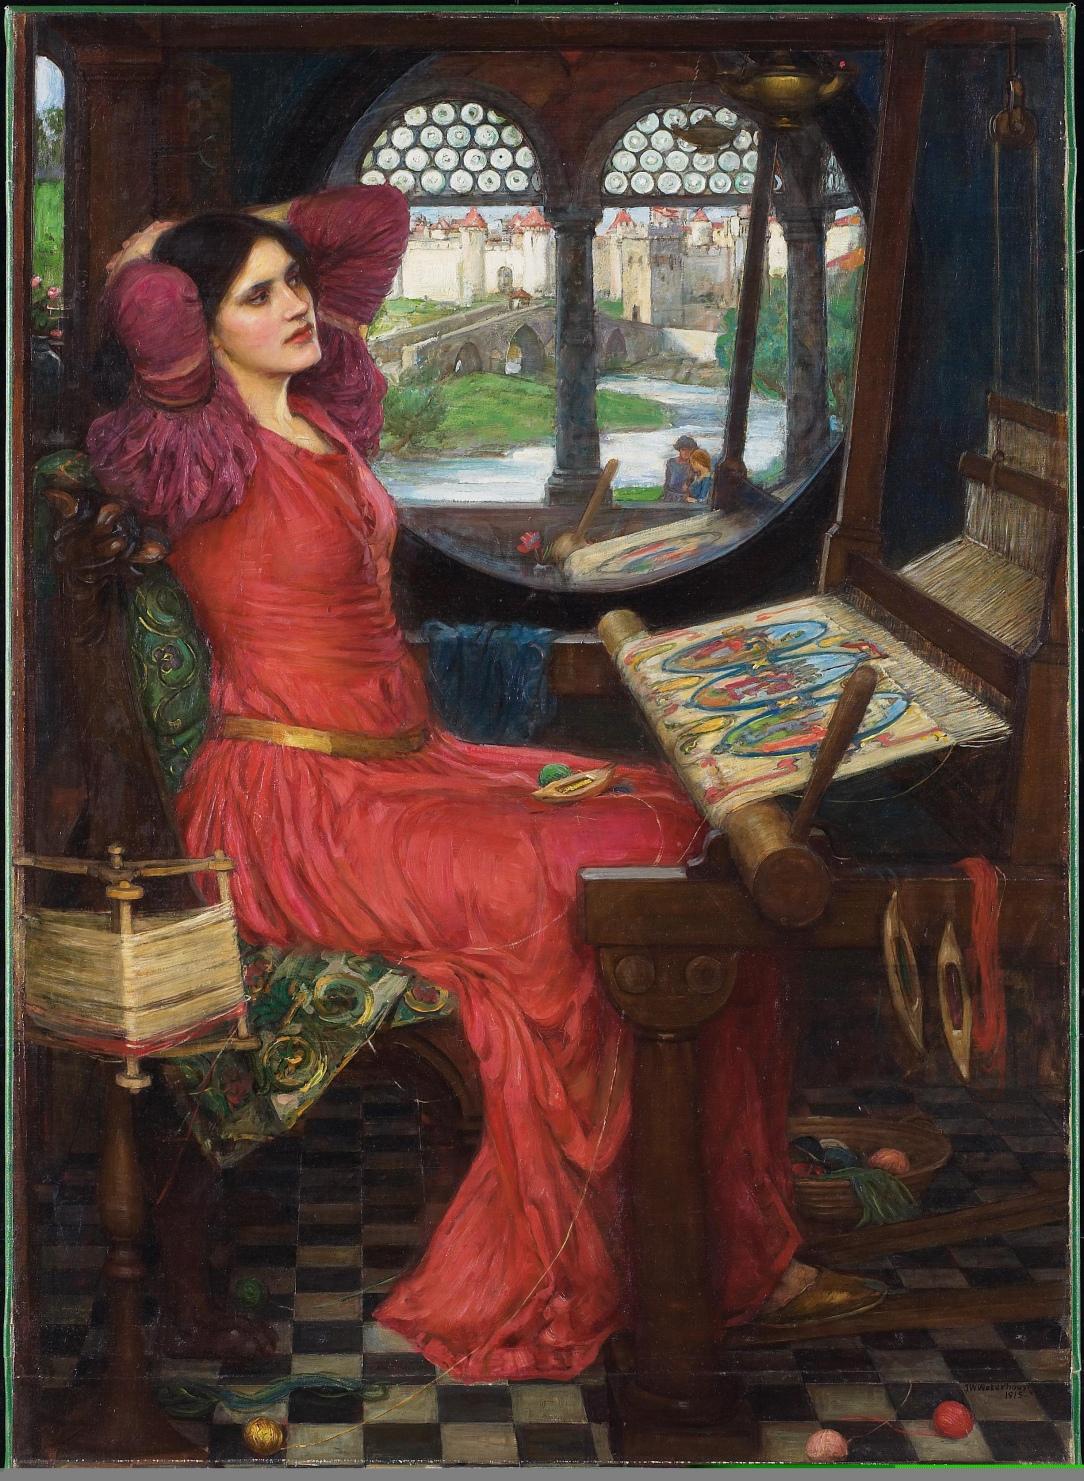 John_William_Waterhouse_-_I_am_half-sick_of_shadows,_said_the_lady_of_shalott.jpg